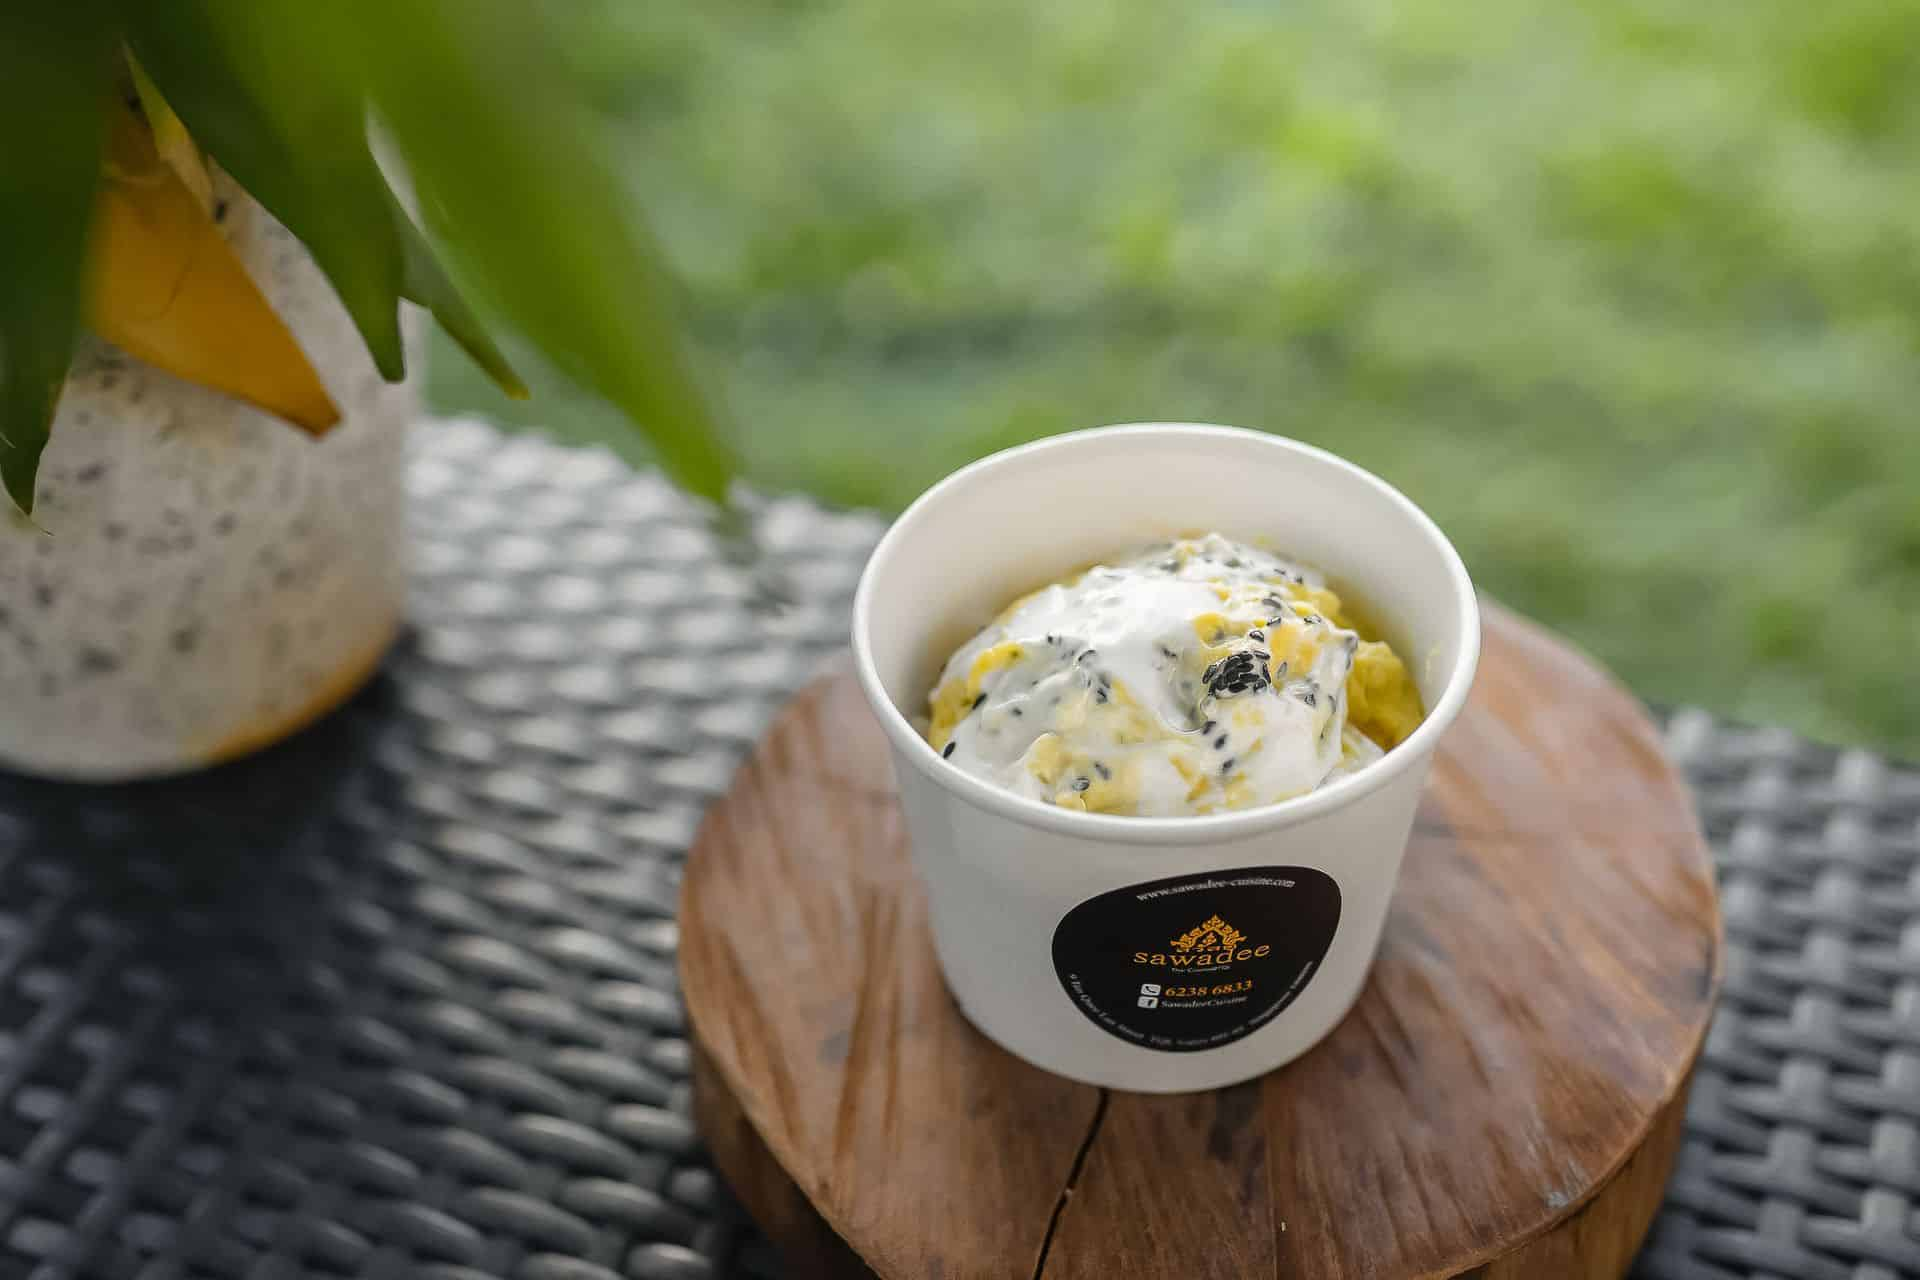 grabdurian durian sticky rice sawadee